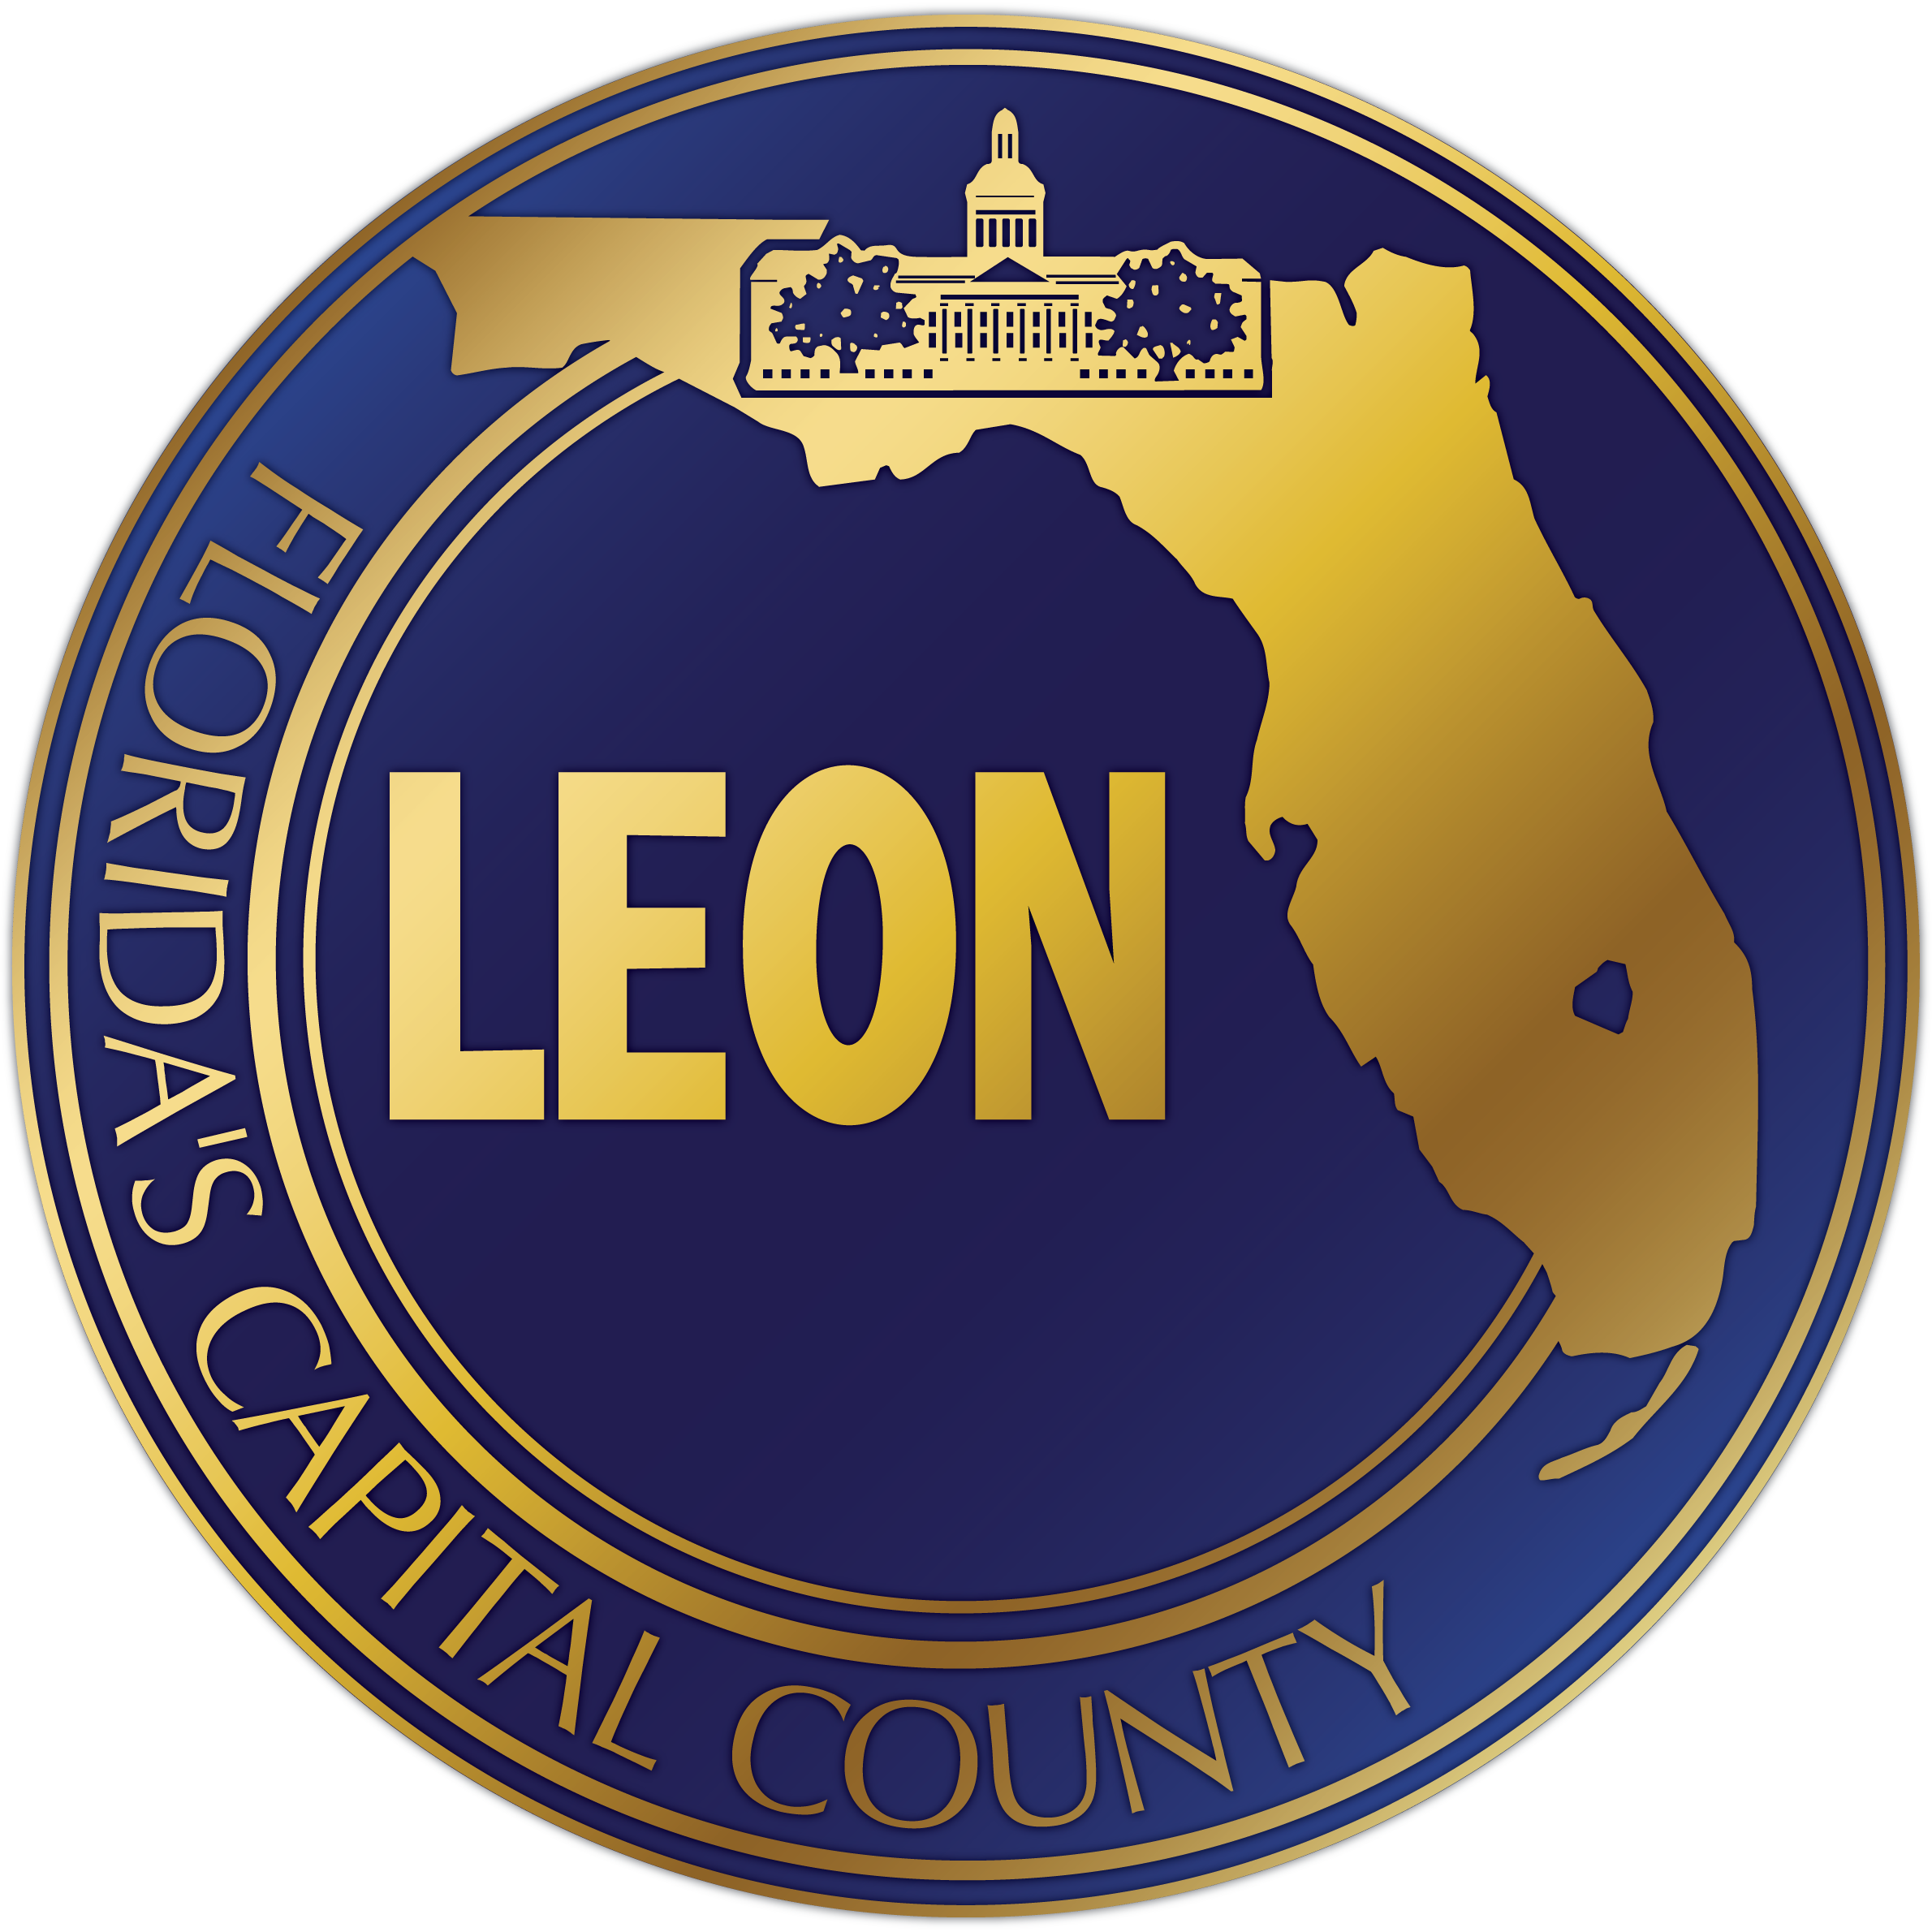 Floridas Capital County